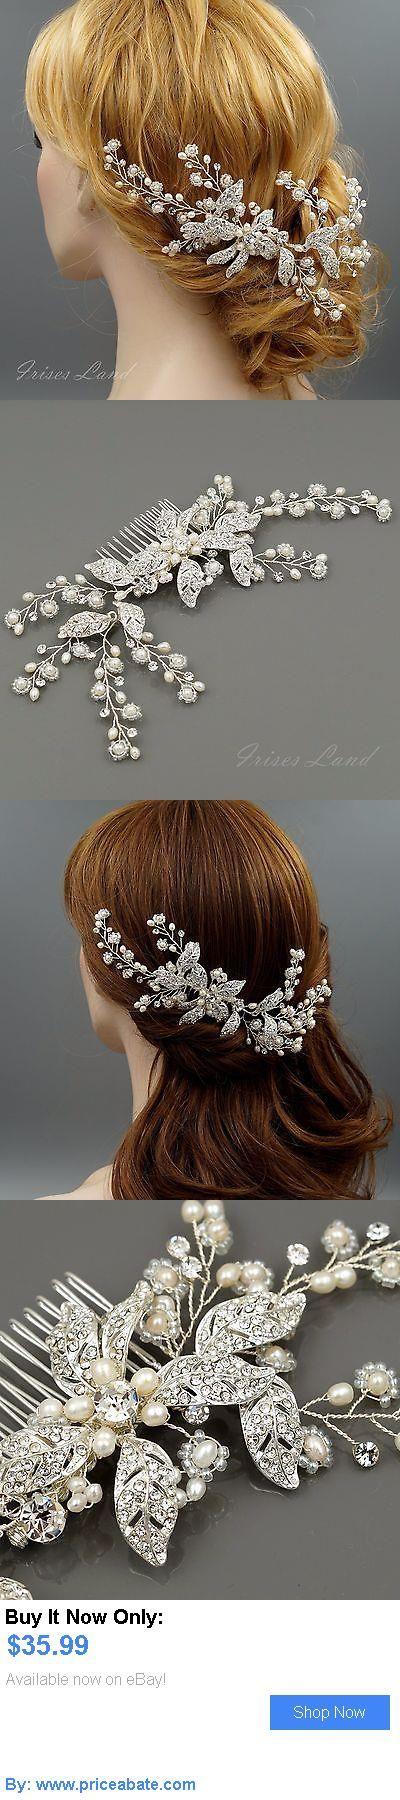 Bridal Accessories: Bridal Hair Comb Freshwater Pearl Crystal Headpiece Wedding Accessories 09873 S BUY IT NOW ONLY: $35.99 #priceabateBridalAccessories OR #priceabate